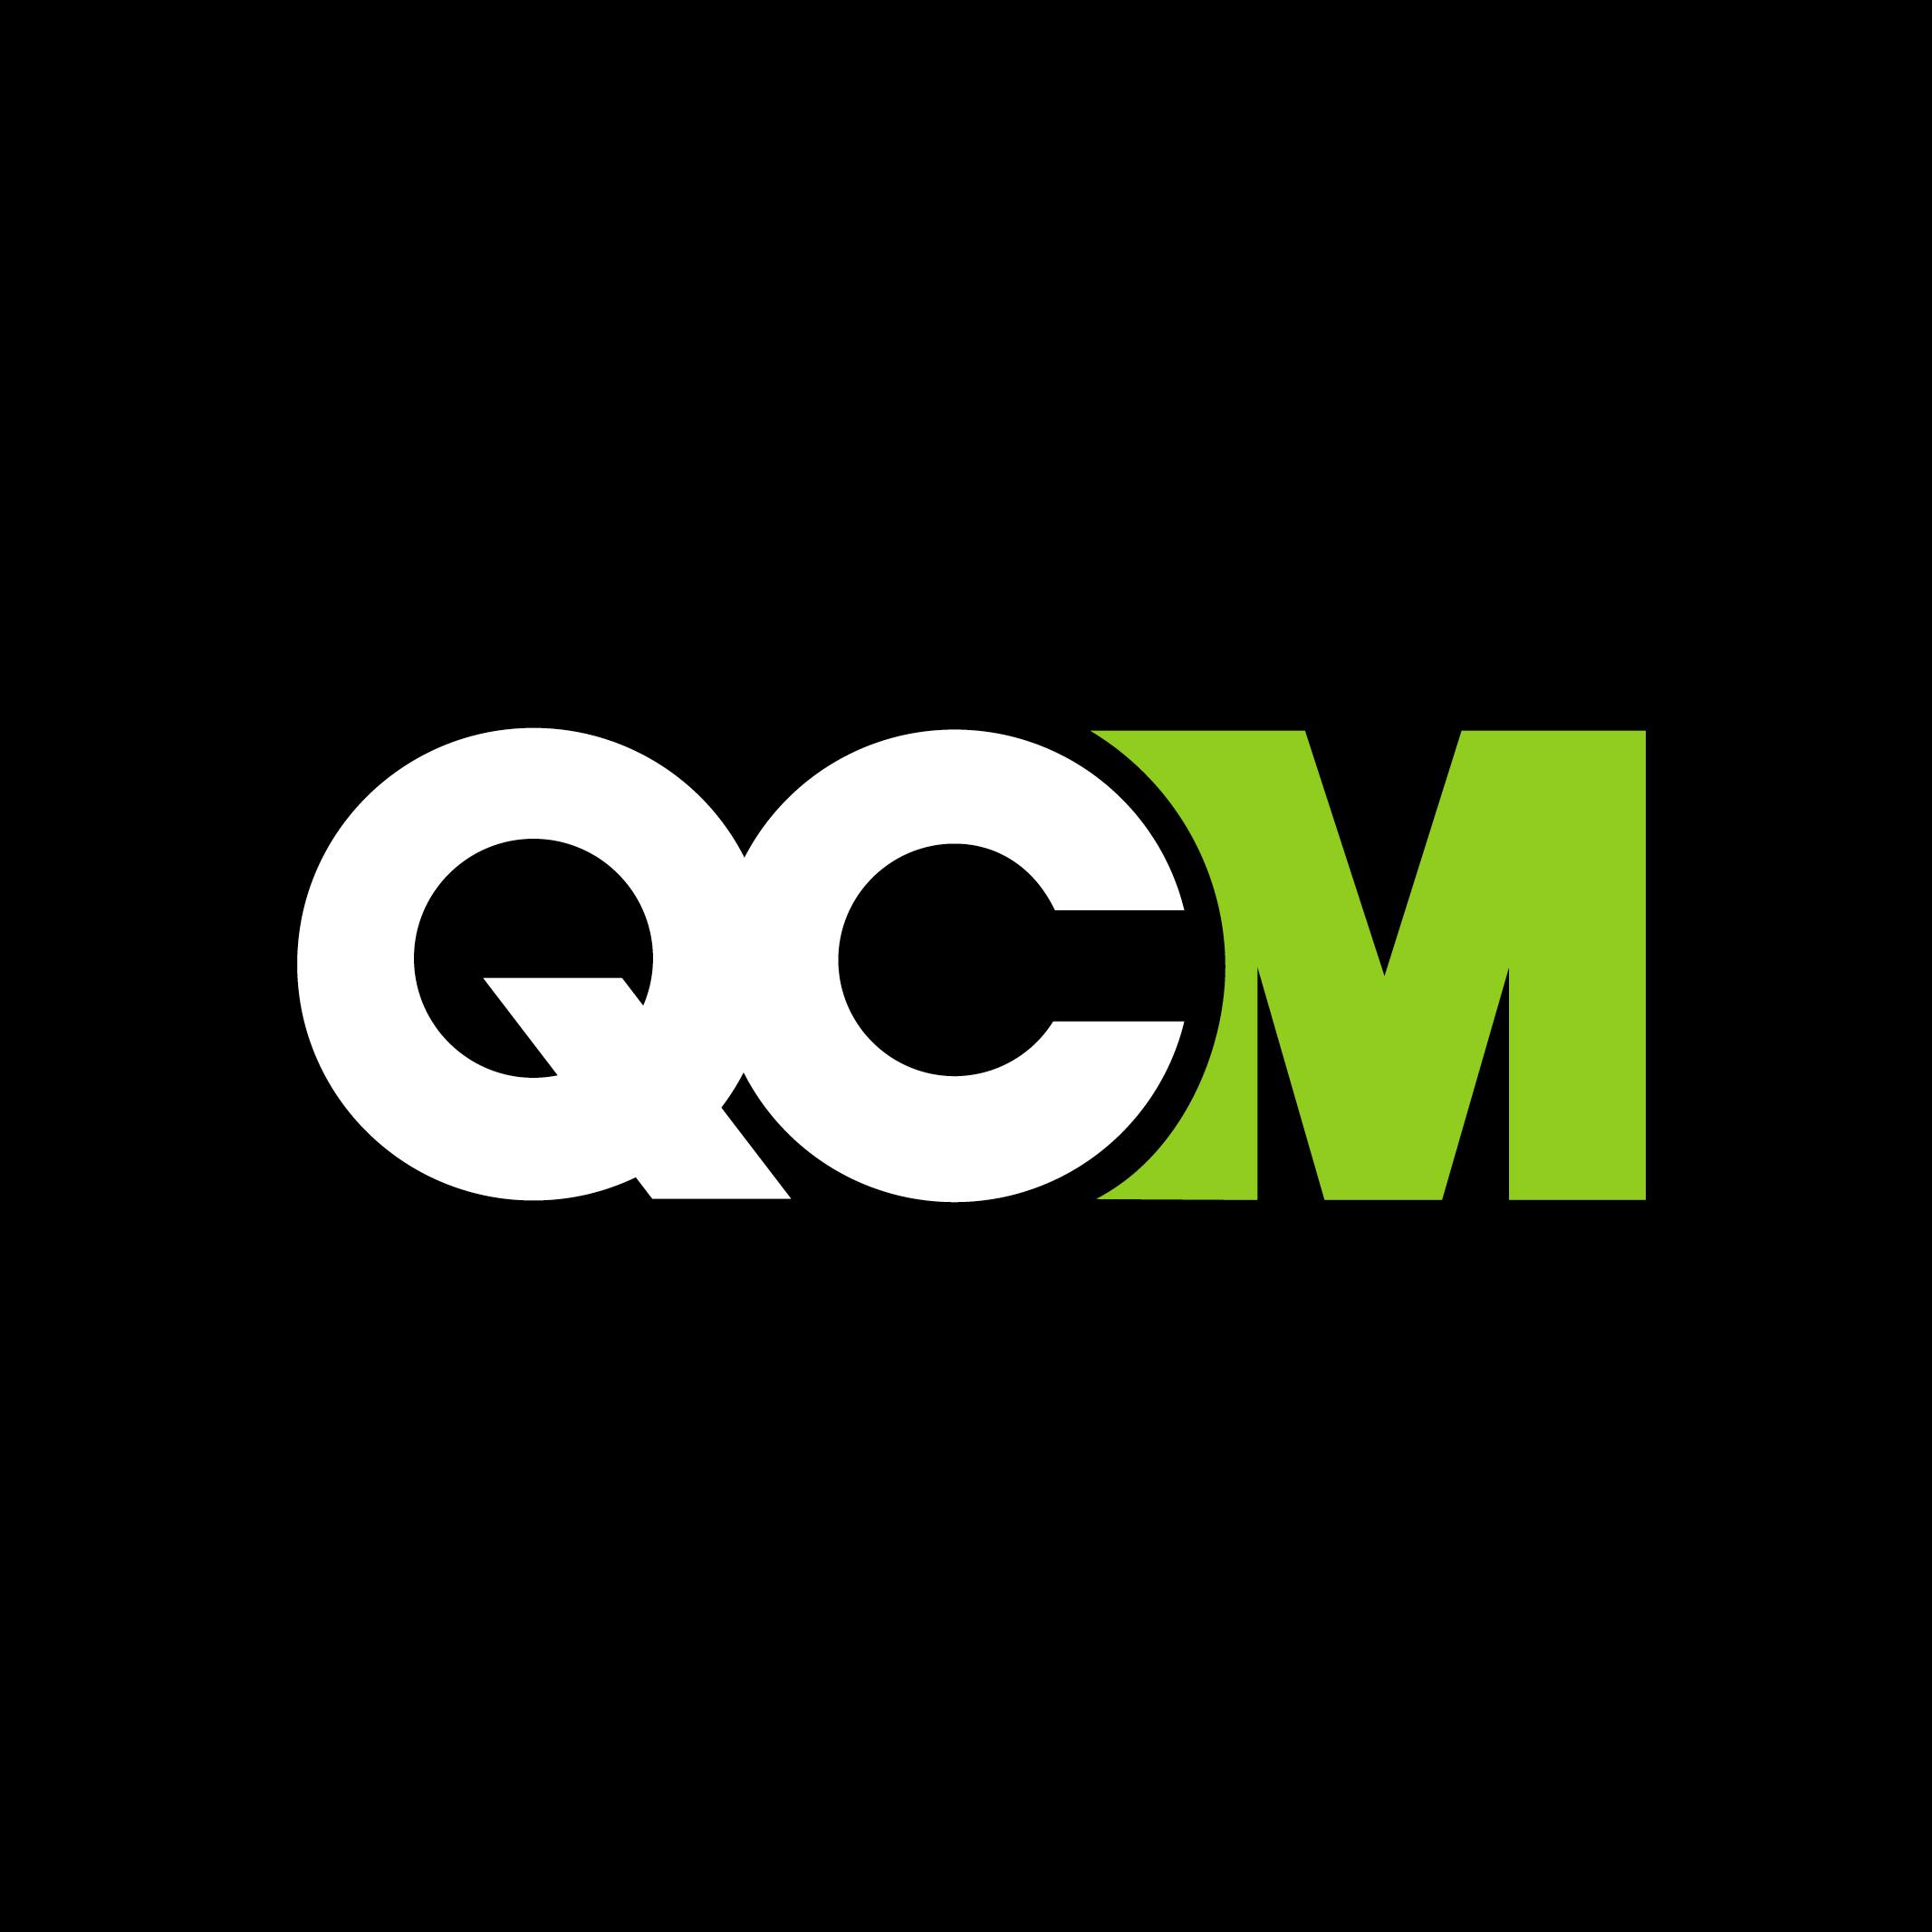 QUCOMM // MARKETING